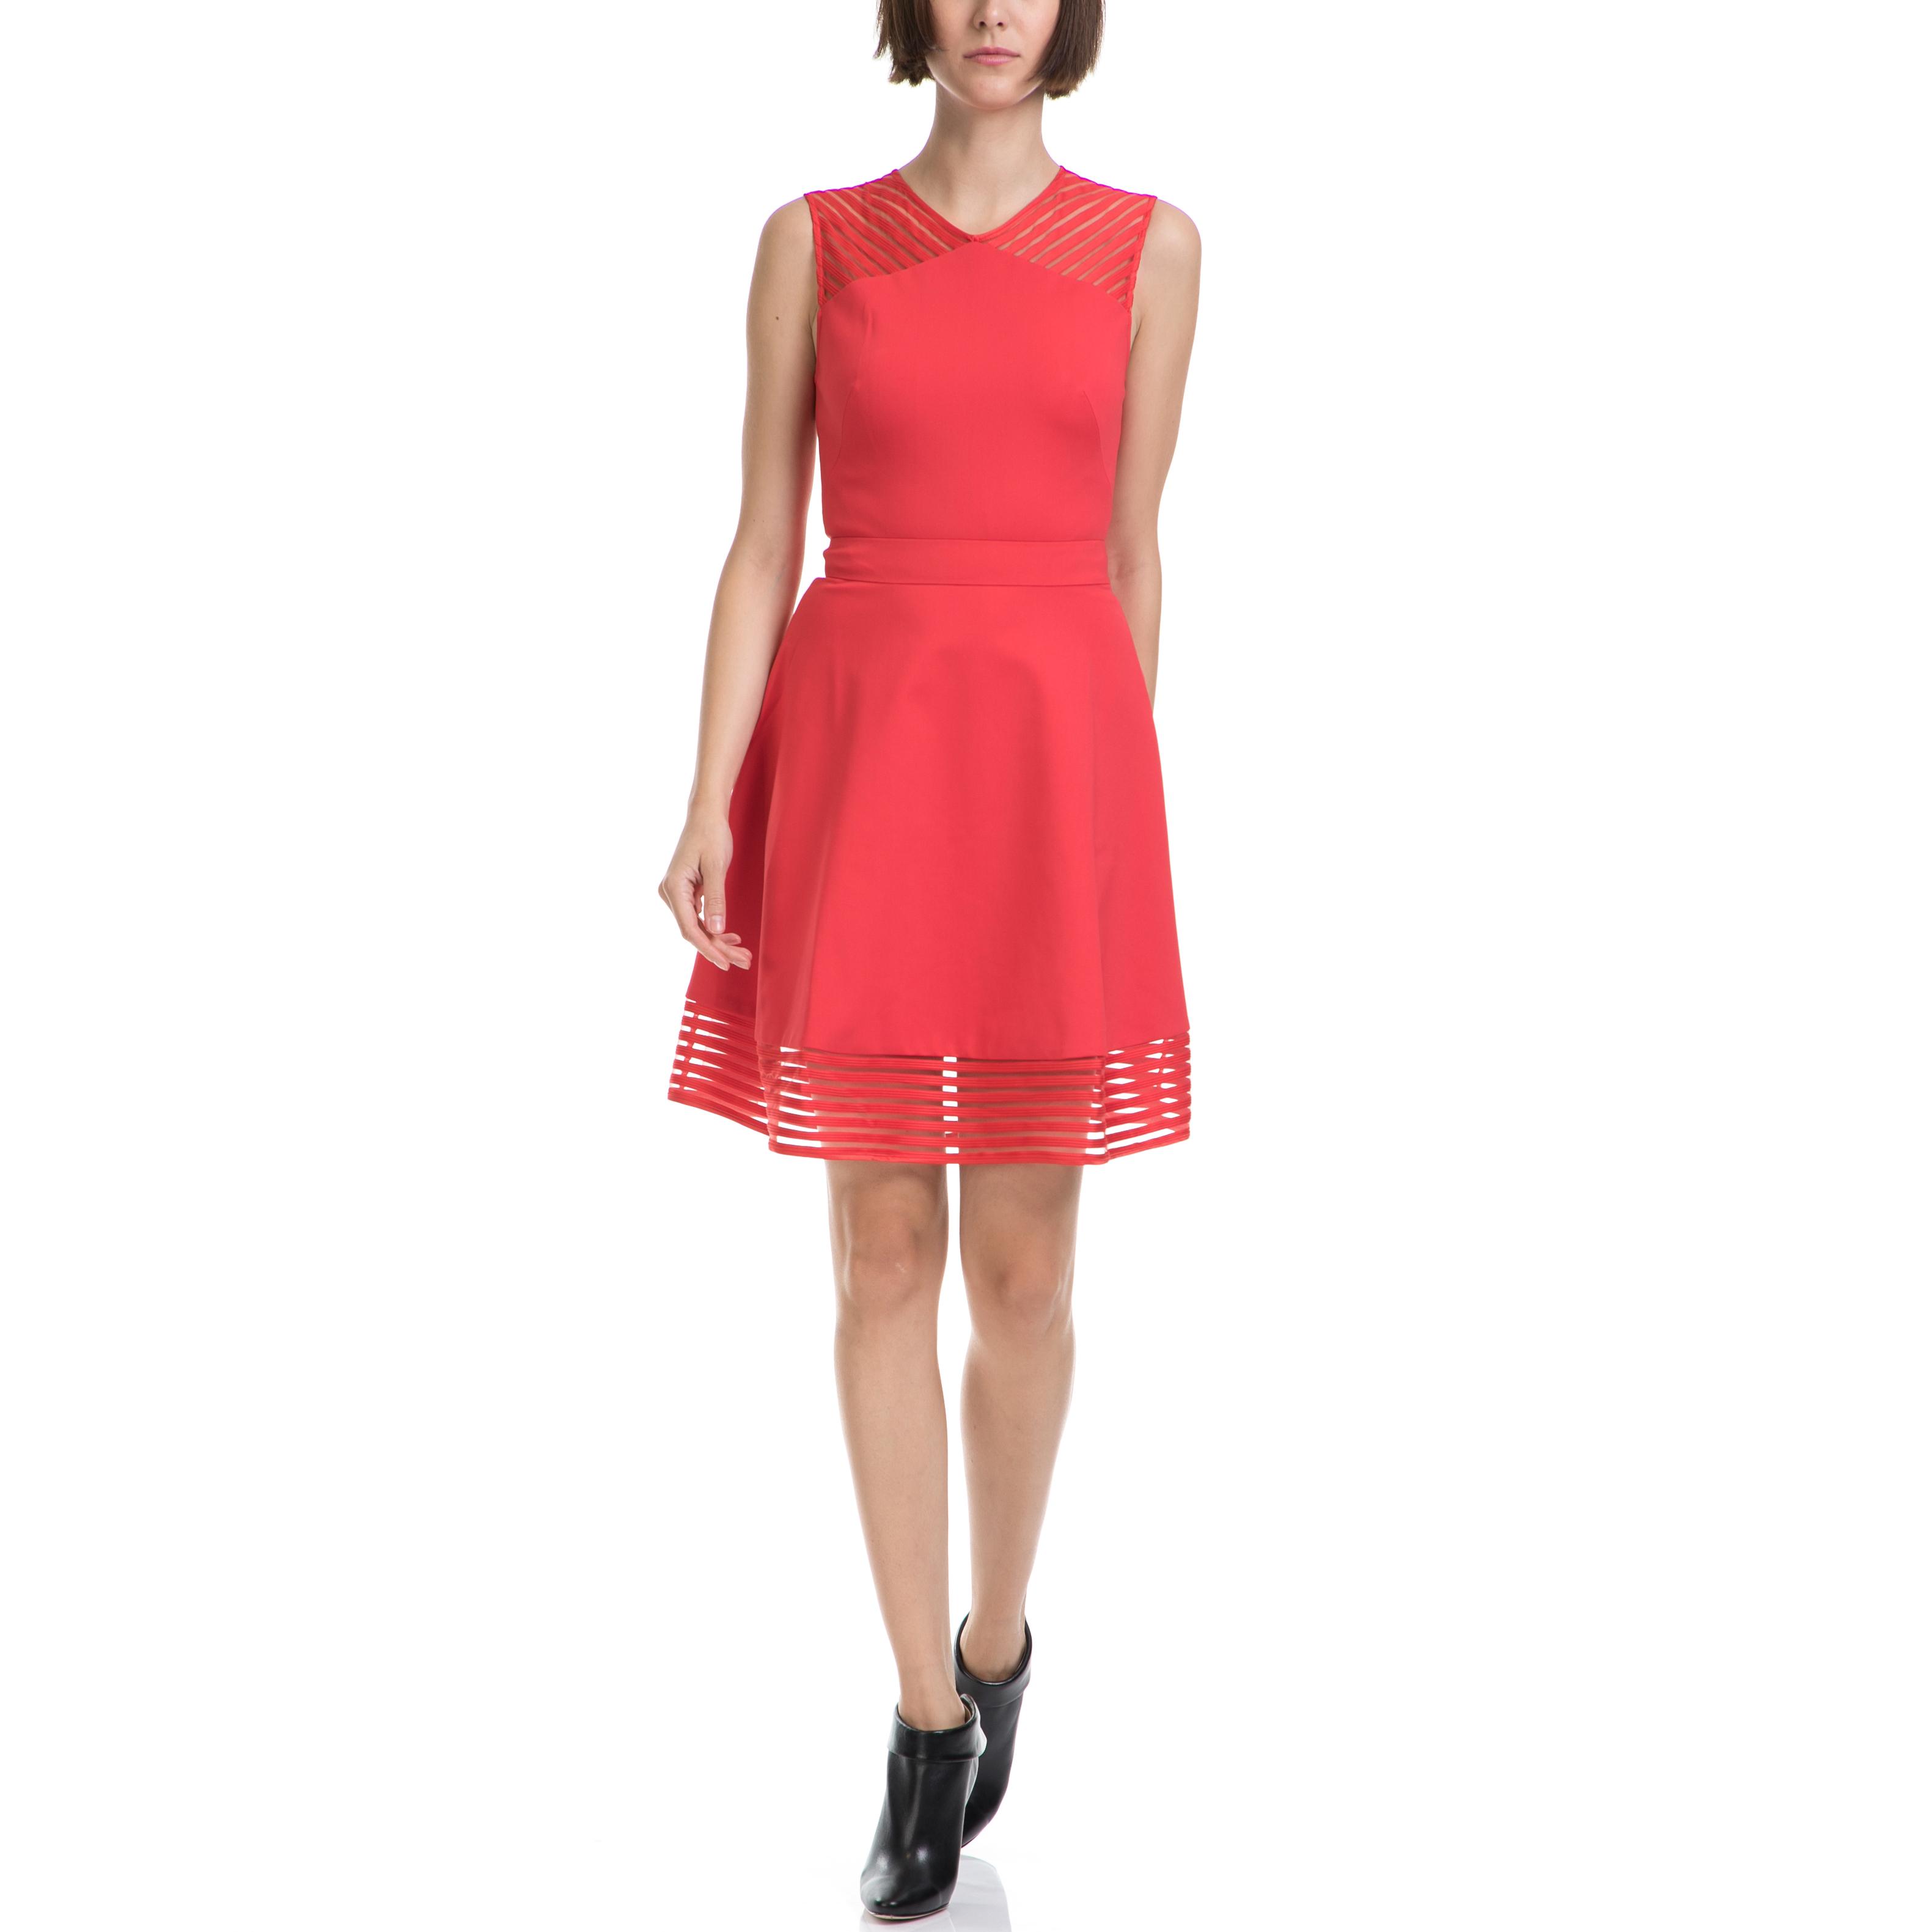 TED BAKER - Γυναικείο φόρεμα TED BAKER πορτοκαλί